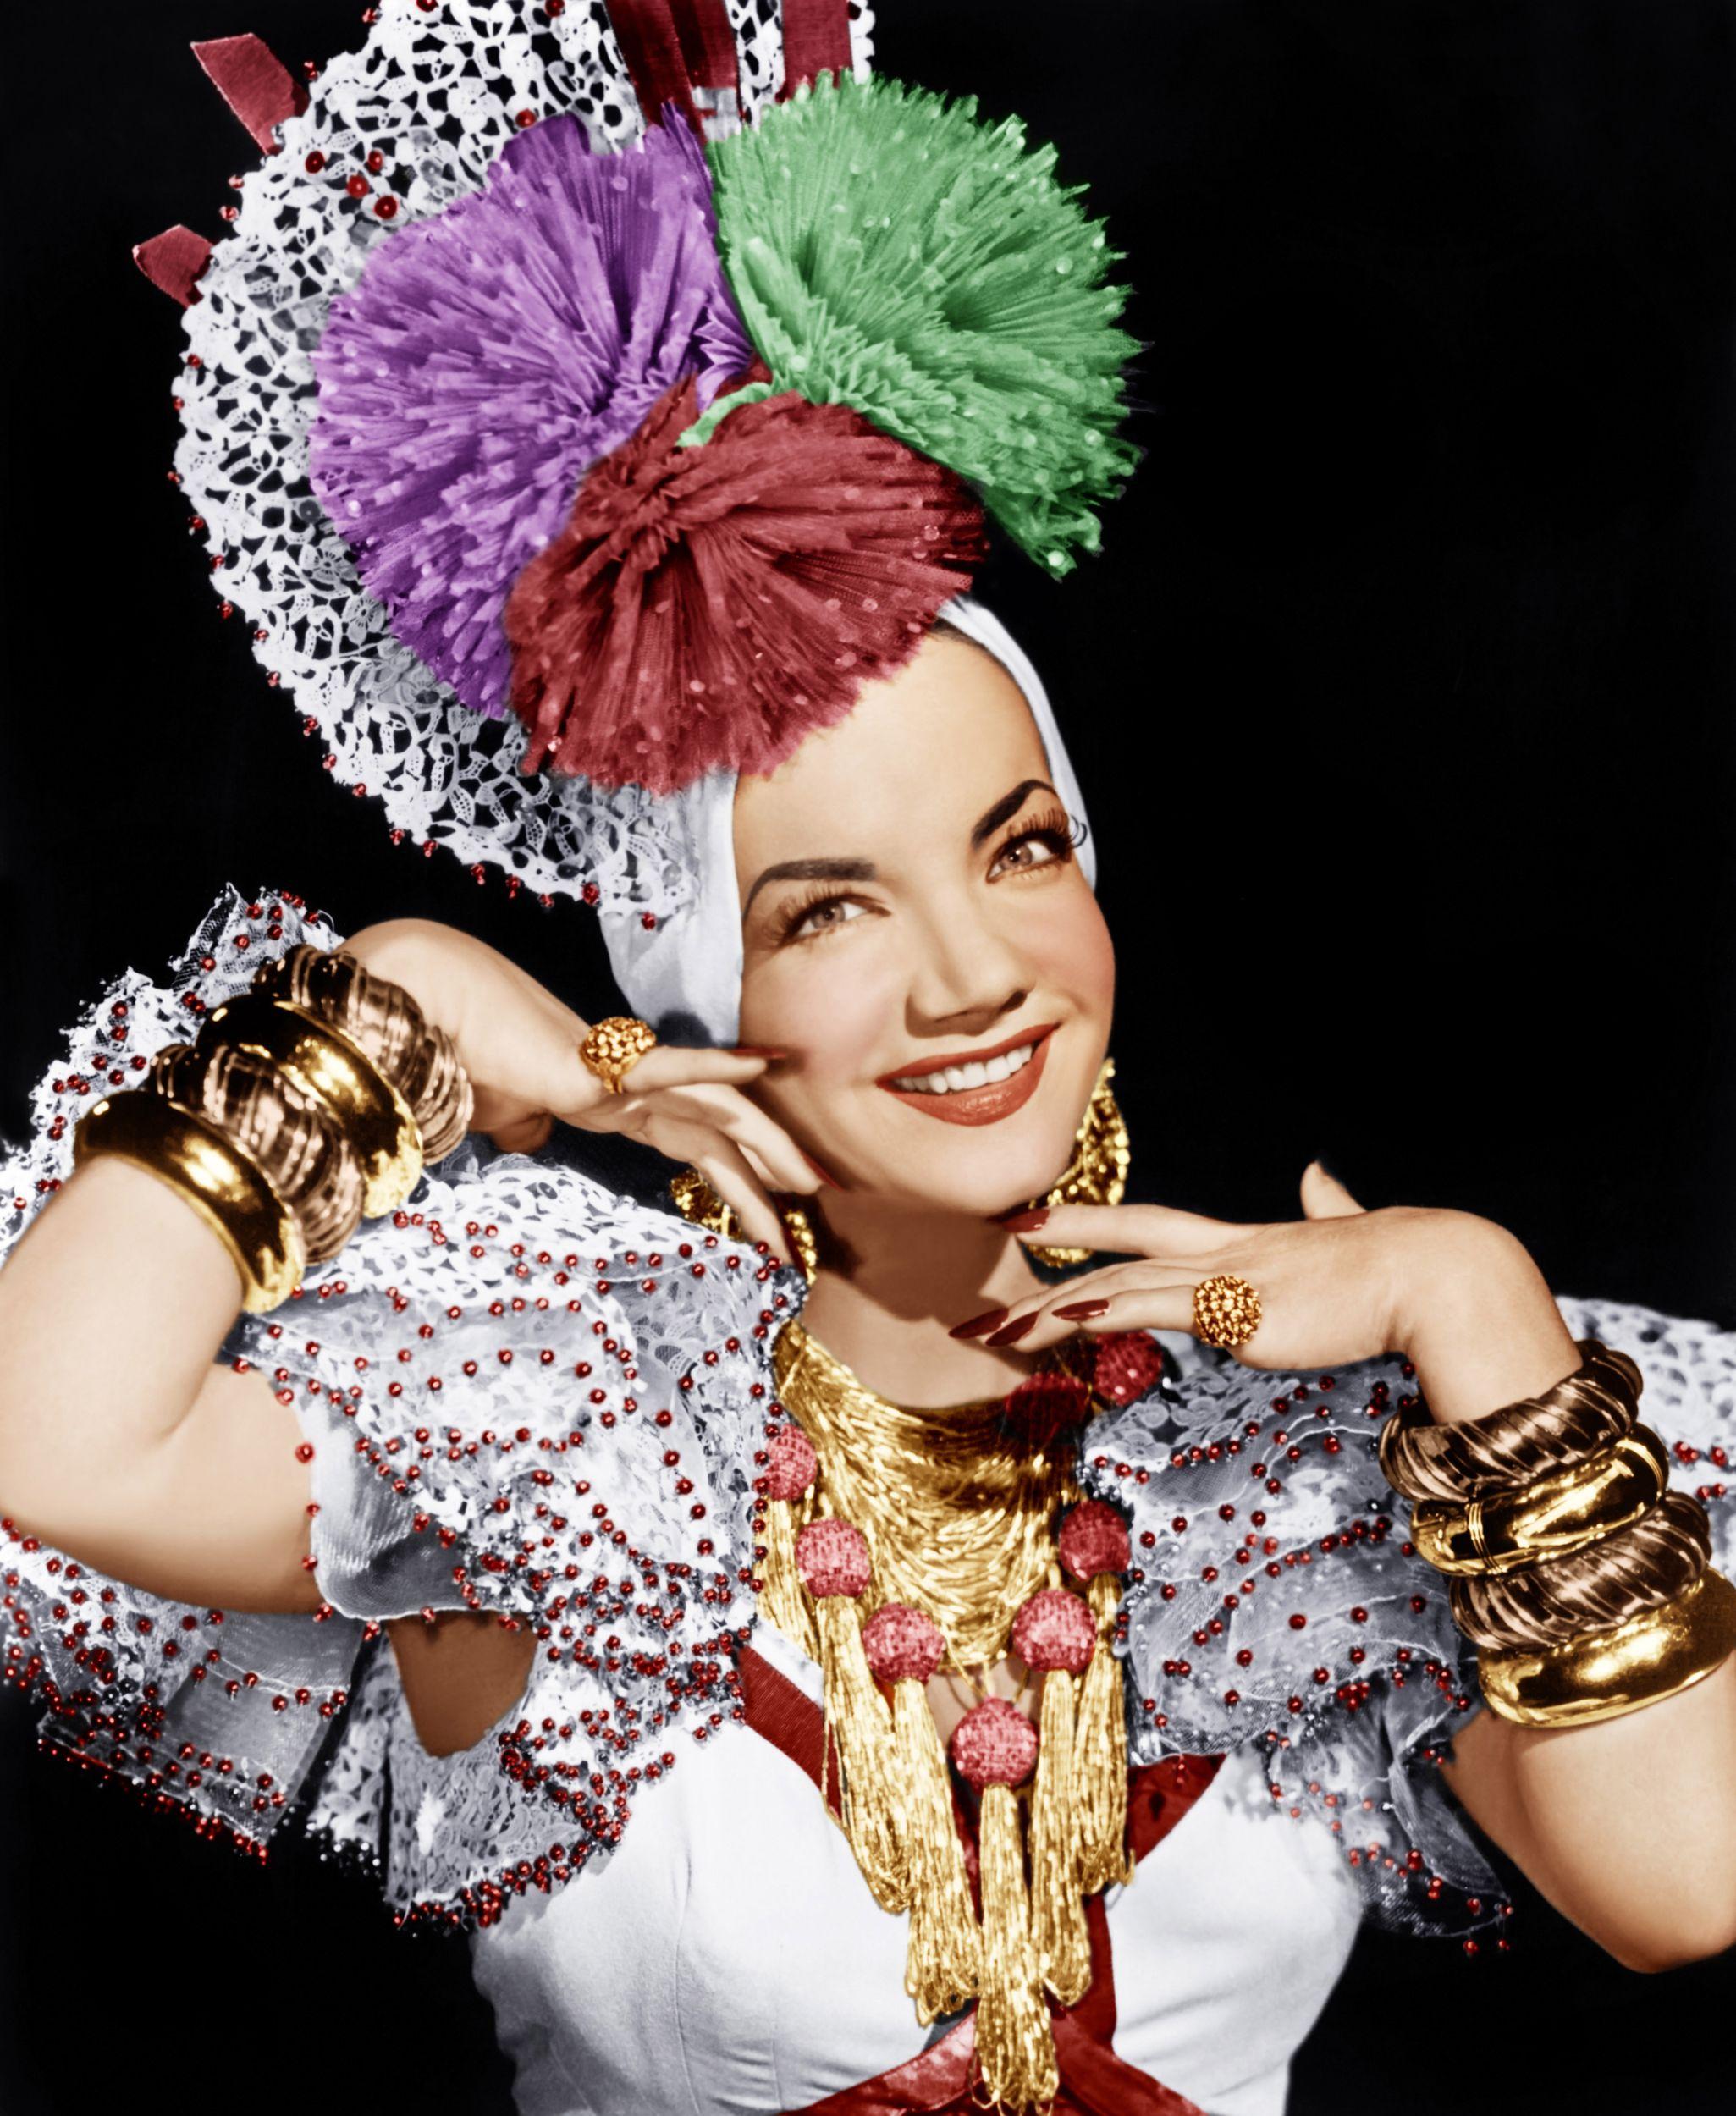 Biografia Carmen Miranda Biography - Biographie Brazilian Singer and Dancer